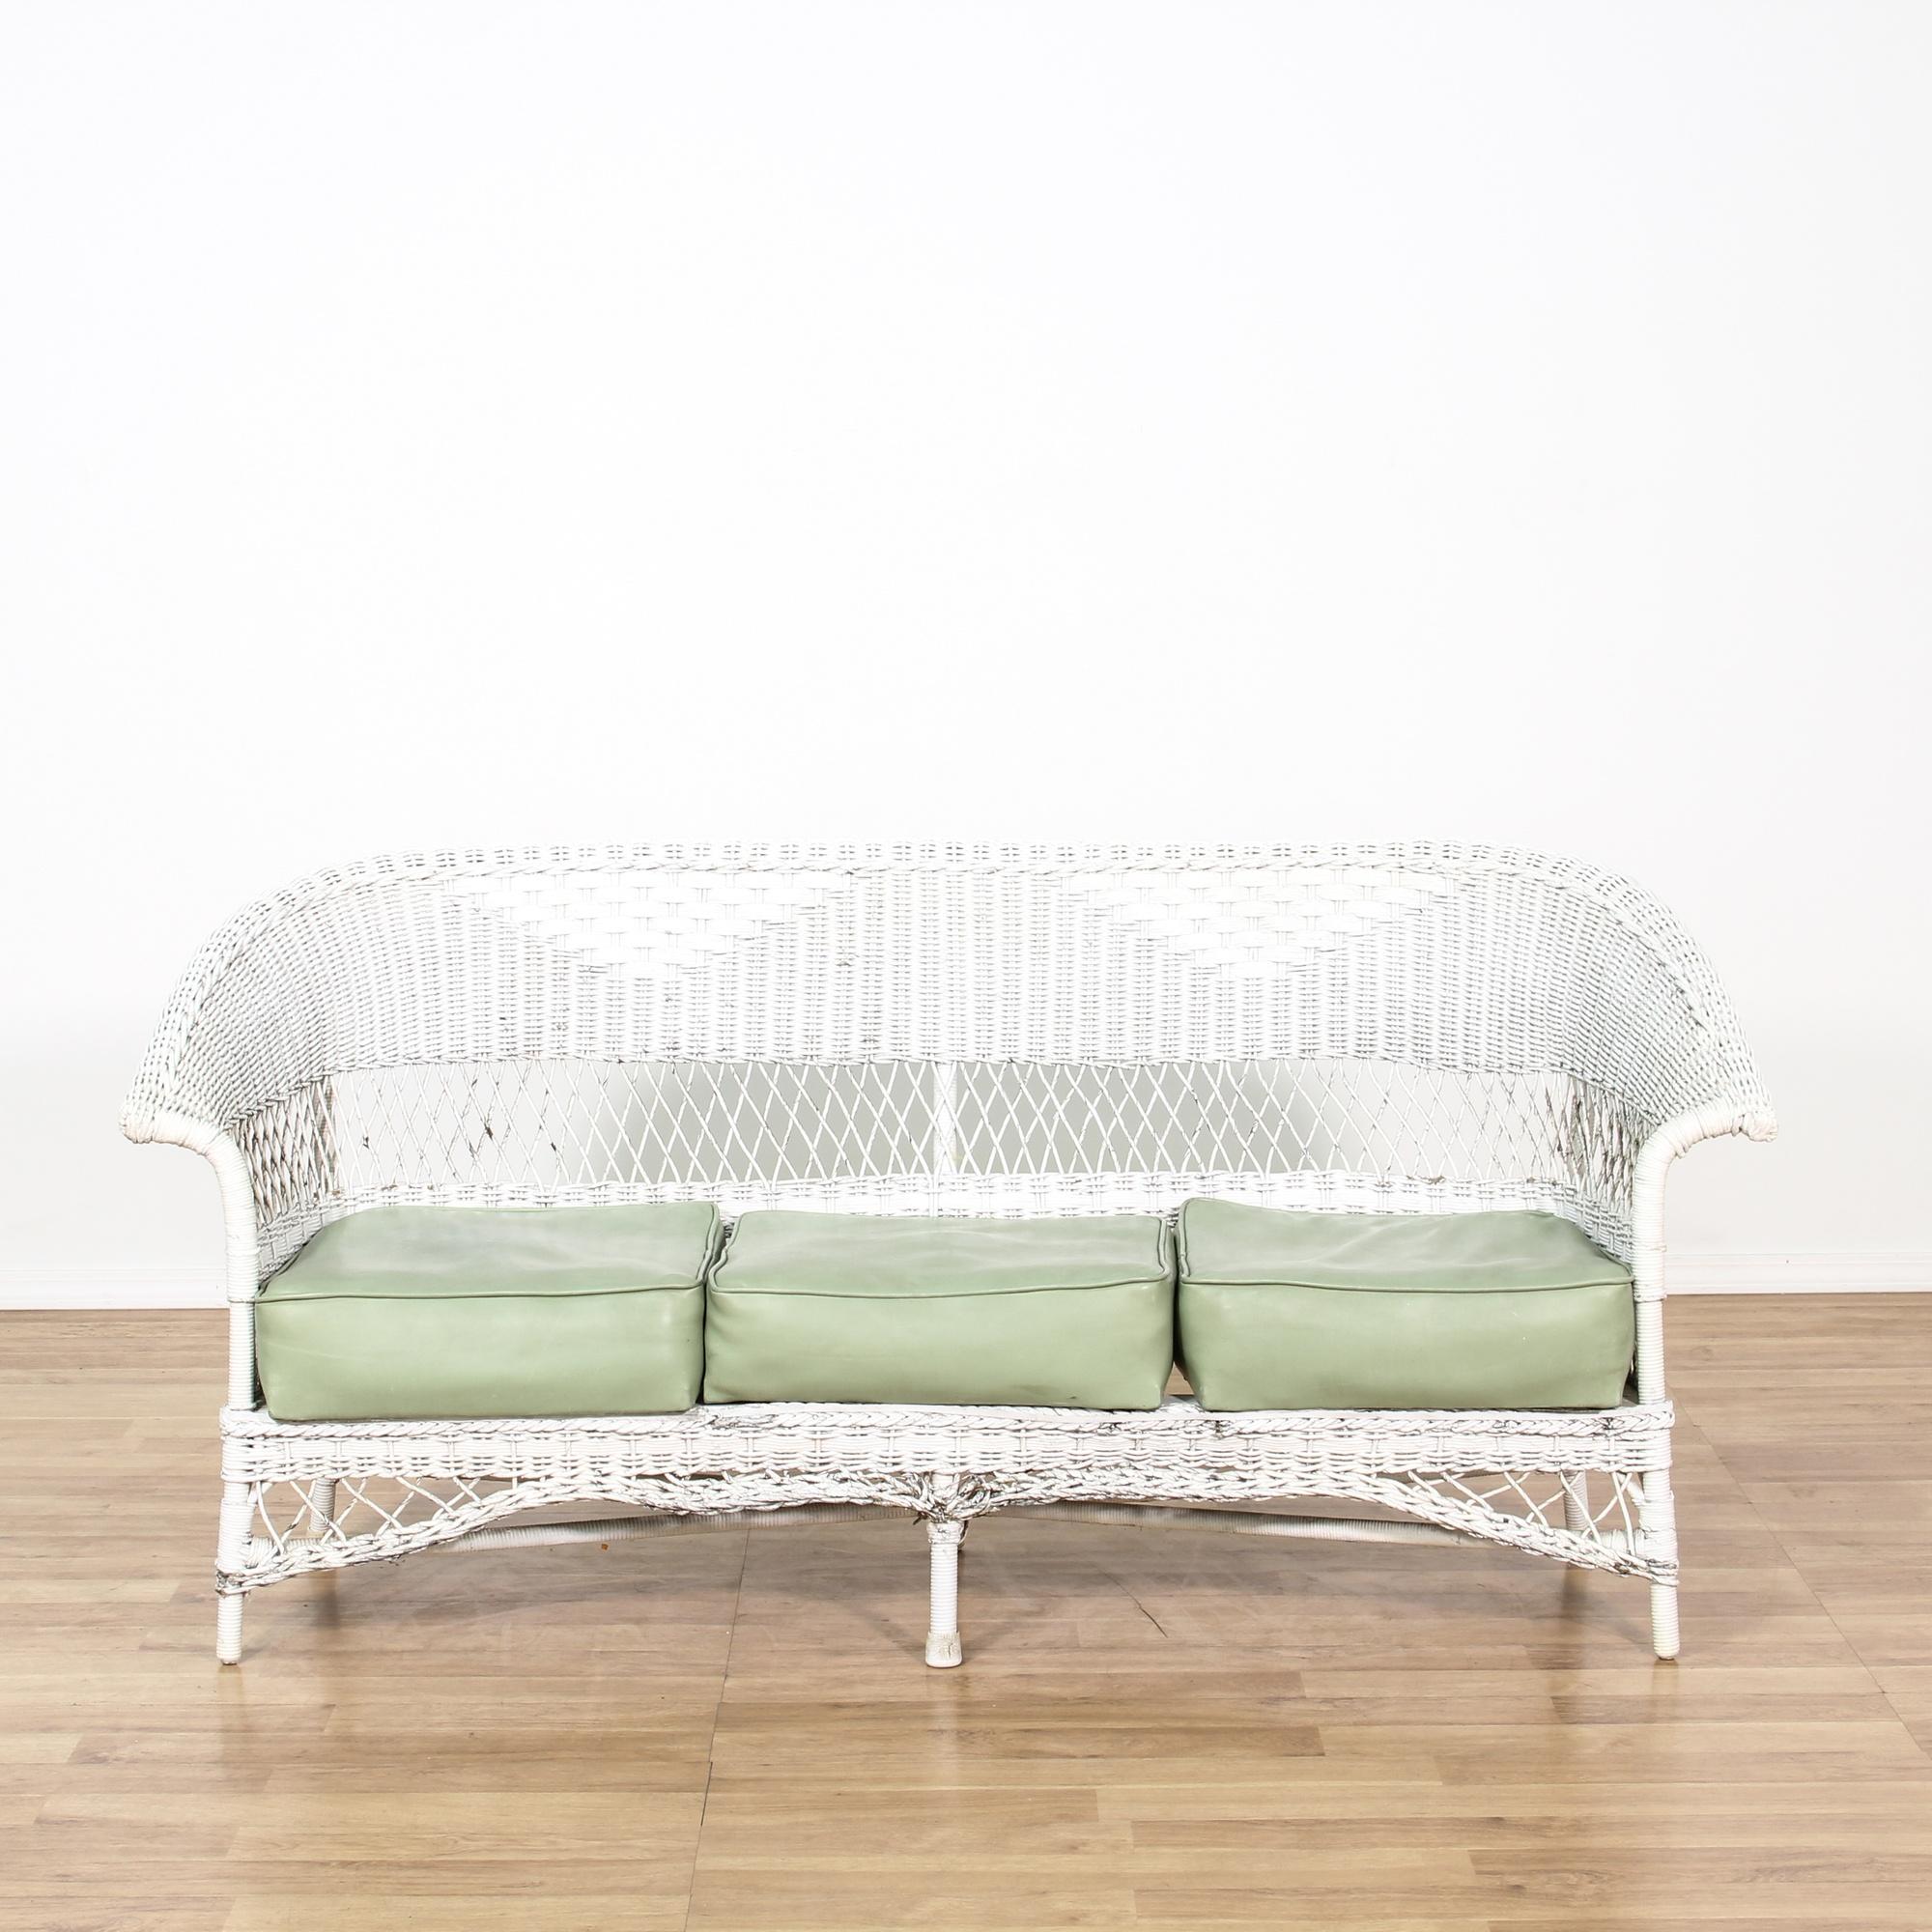 Cottage Chic White Wicker Loveseat Sofa Loveseat Vintage Furniture San Diego Los Angeles